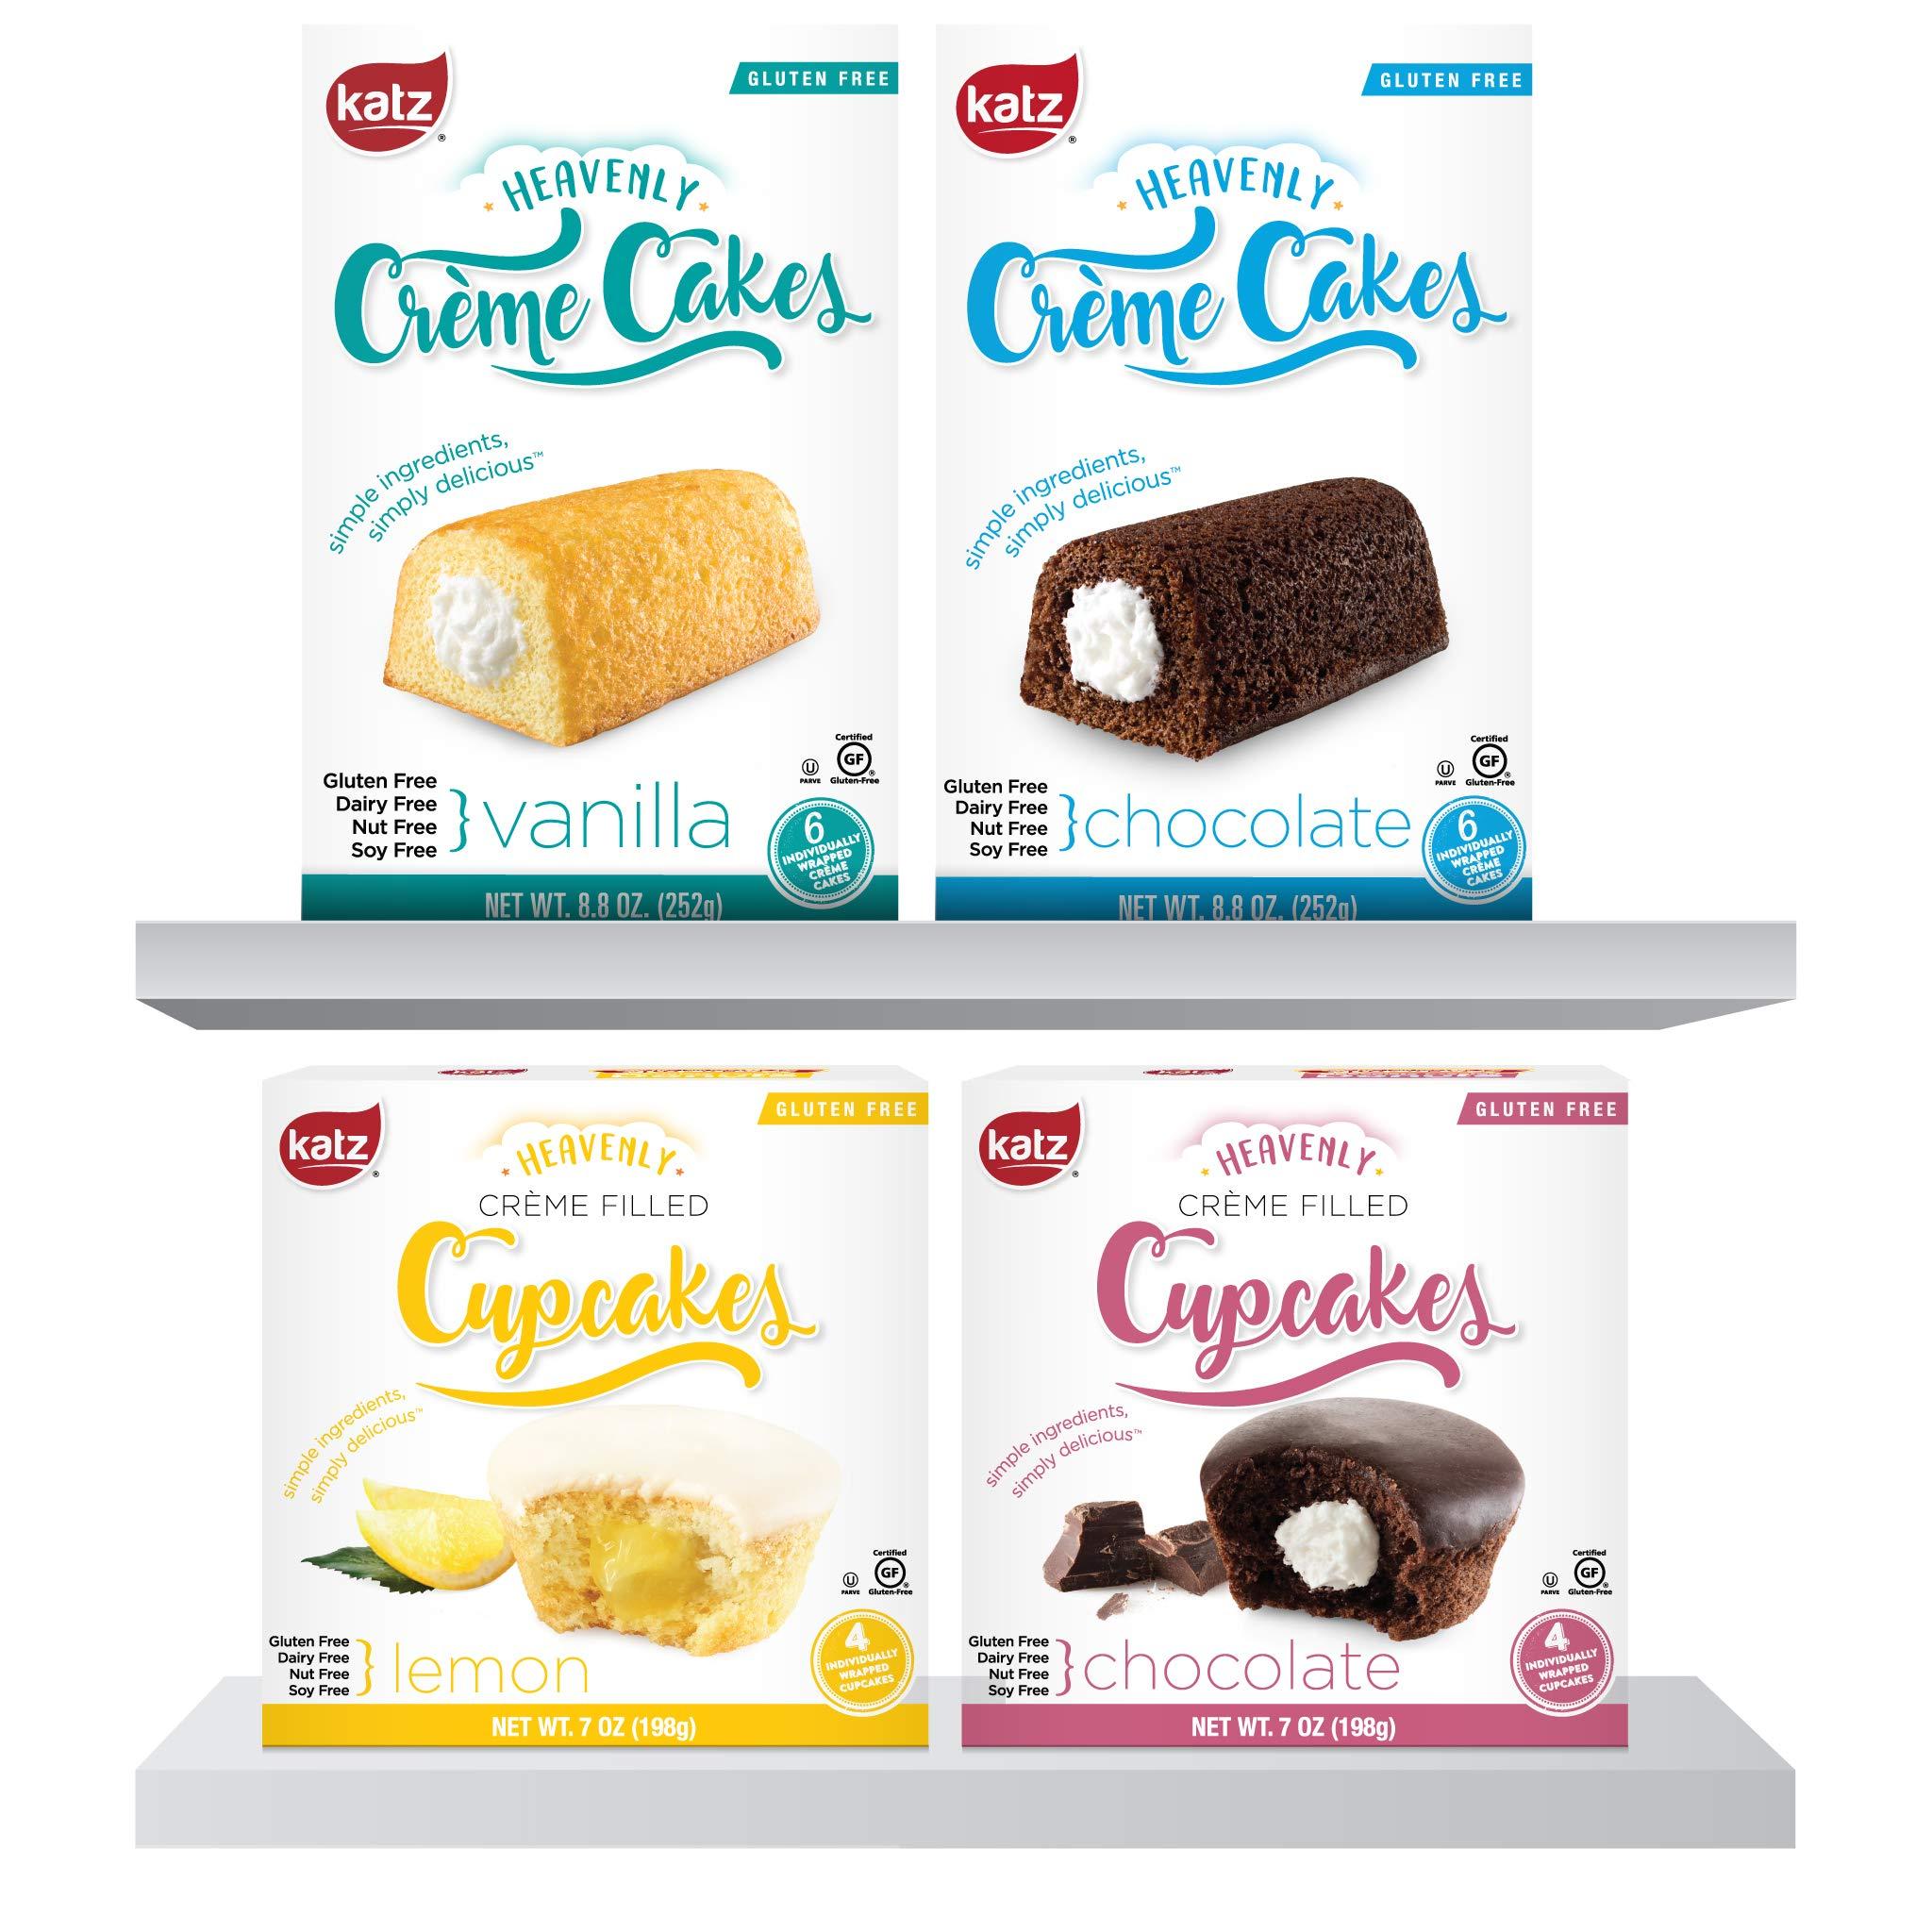 Katz Gluten Free Heavenly Creme Cake Variety Pack | Chocolate & Vanilla Creme Cake, Chocolate & Lemon Cupcake | Dairy, Nut, Soy and Gluten Free | Kosher (1 Pack of each)